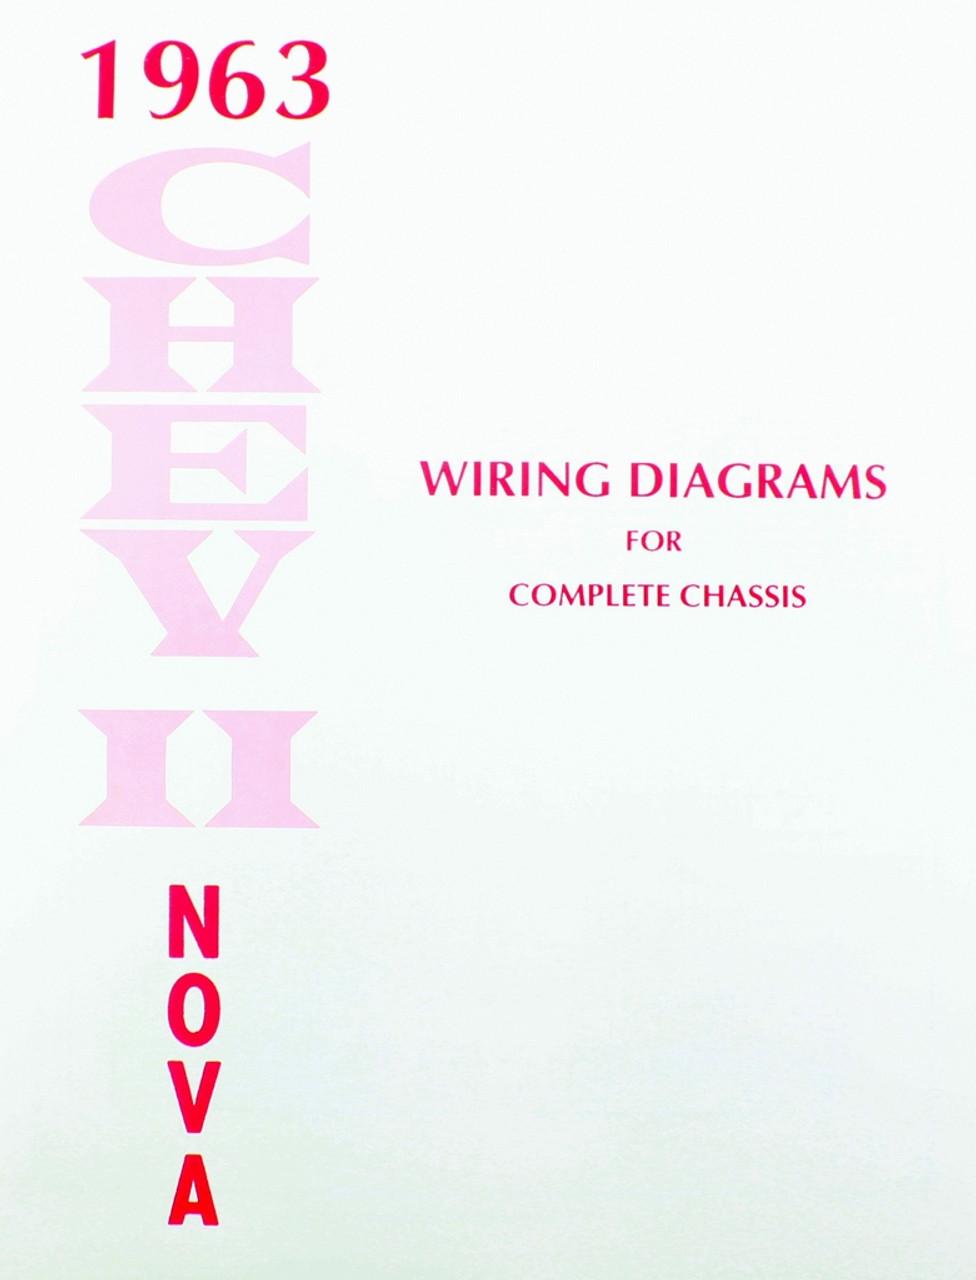 dash wiring schematic for 66 nova images gallery [ 781 x 1024 Pixel ]